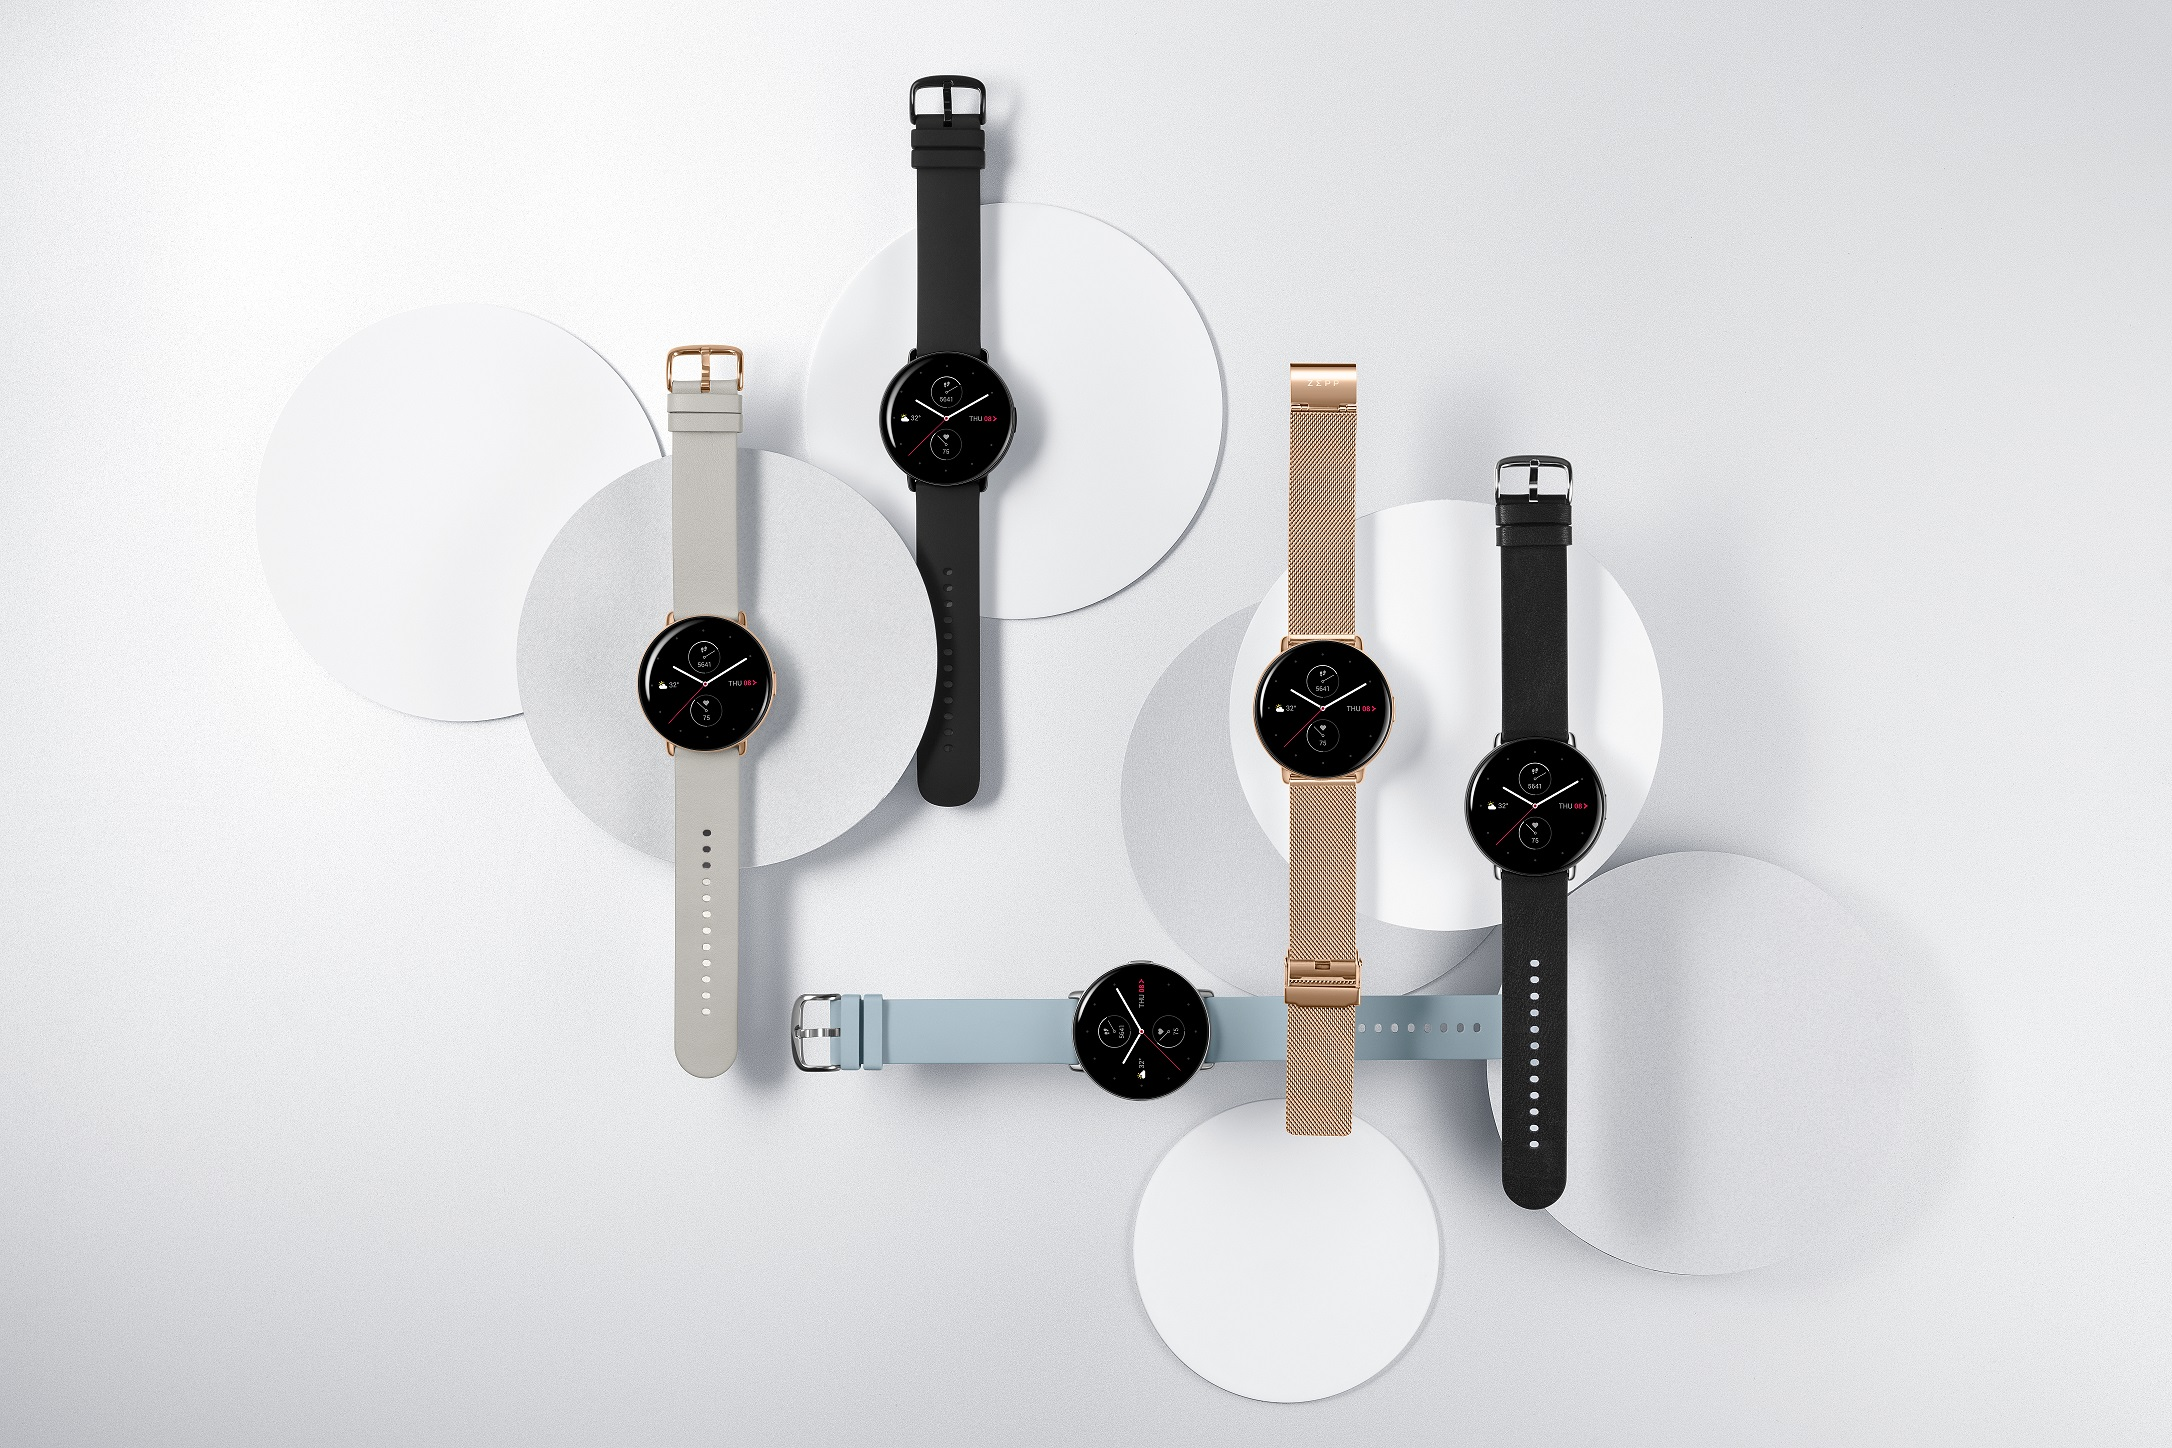 Zepp E smartwatch